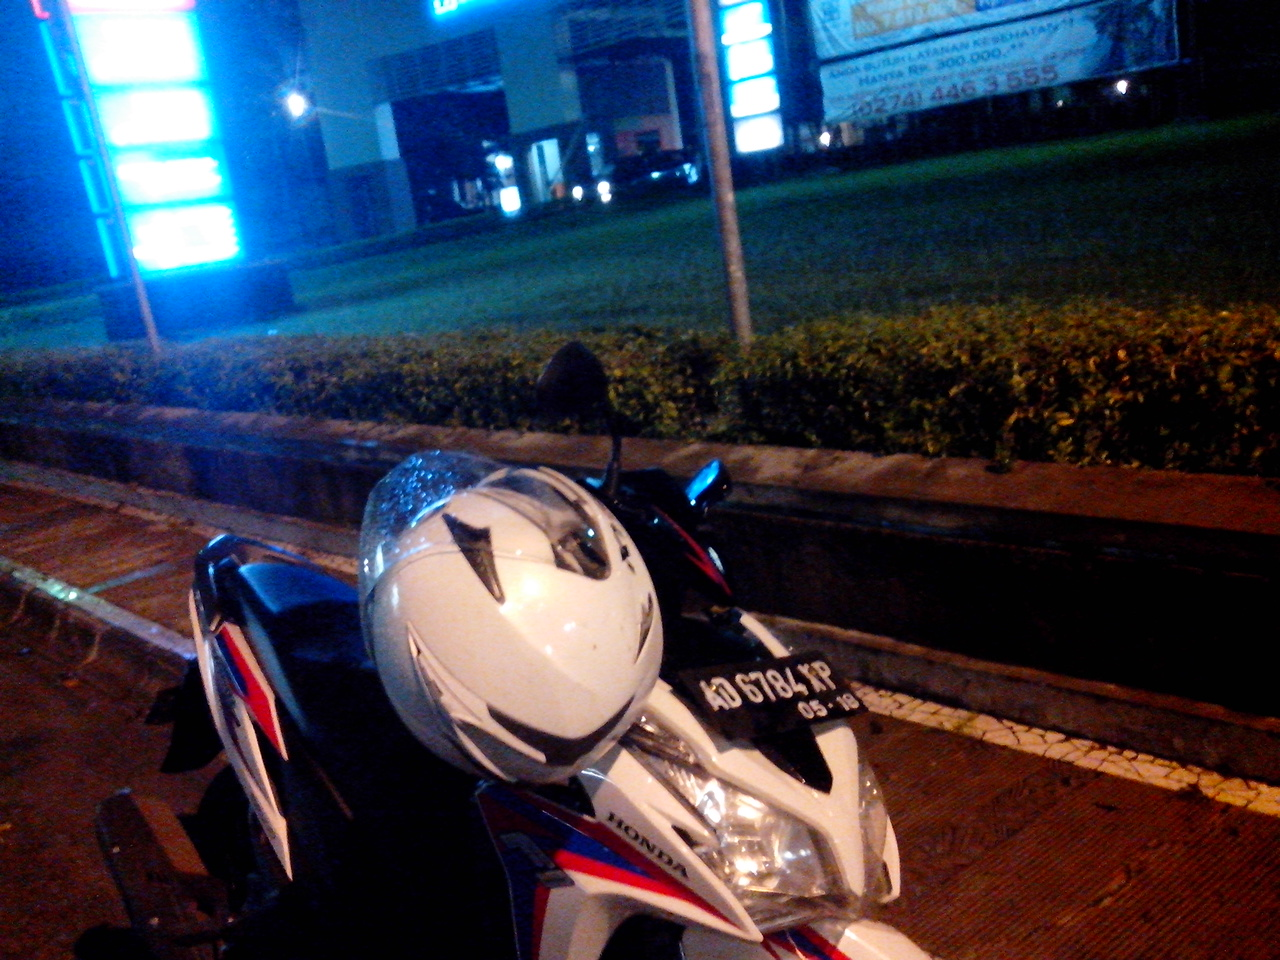 Jajal Inreyen Honda Vario 125 Pinjeman Ke Jogja THE COOLRIDERS